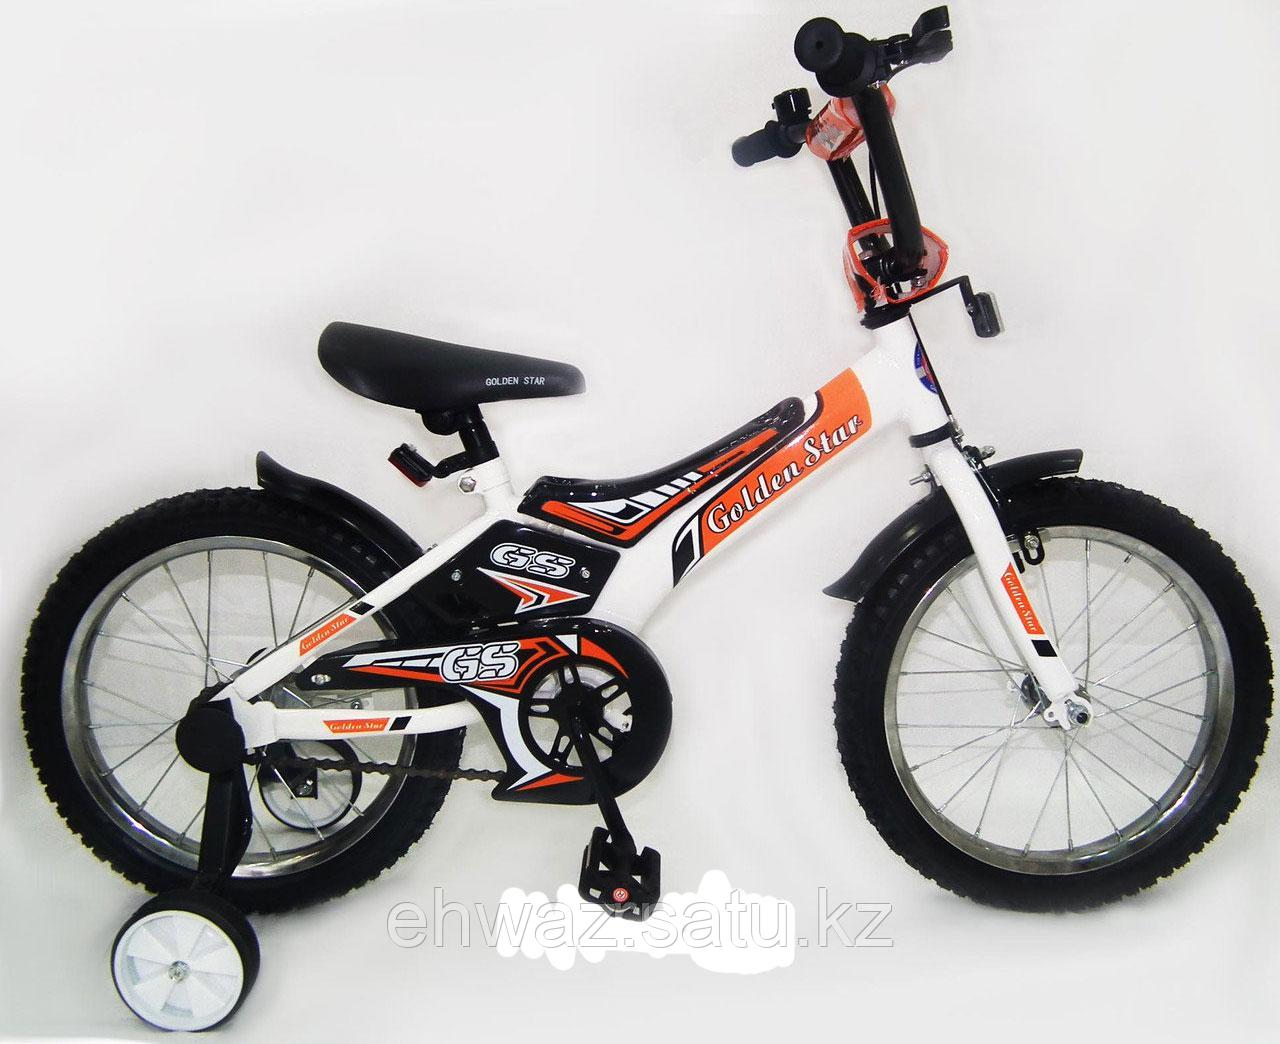 "Детский велосипед Голден Стар 16"" от 3-6 лет"